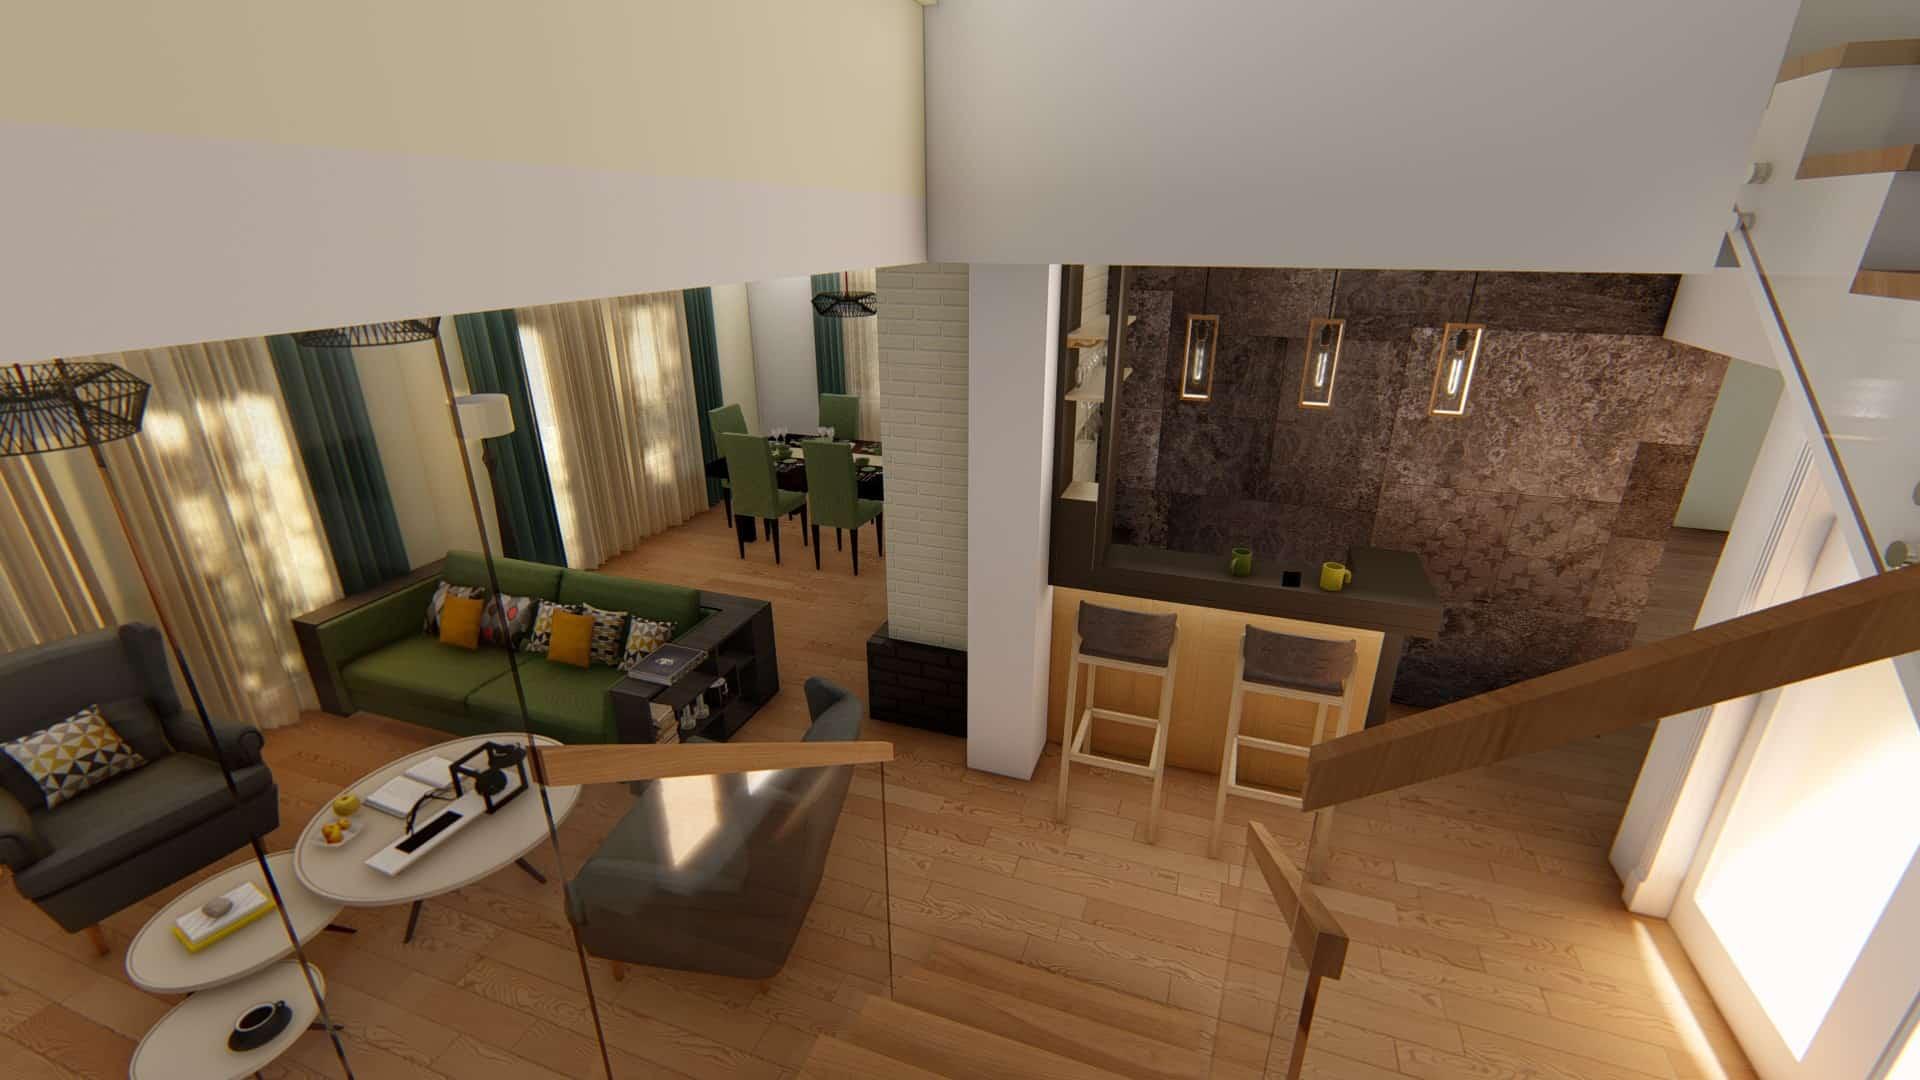 scara spre living room modern